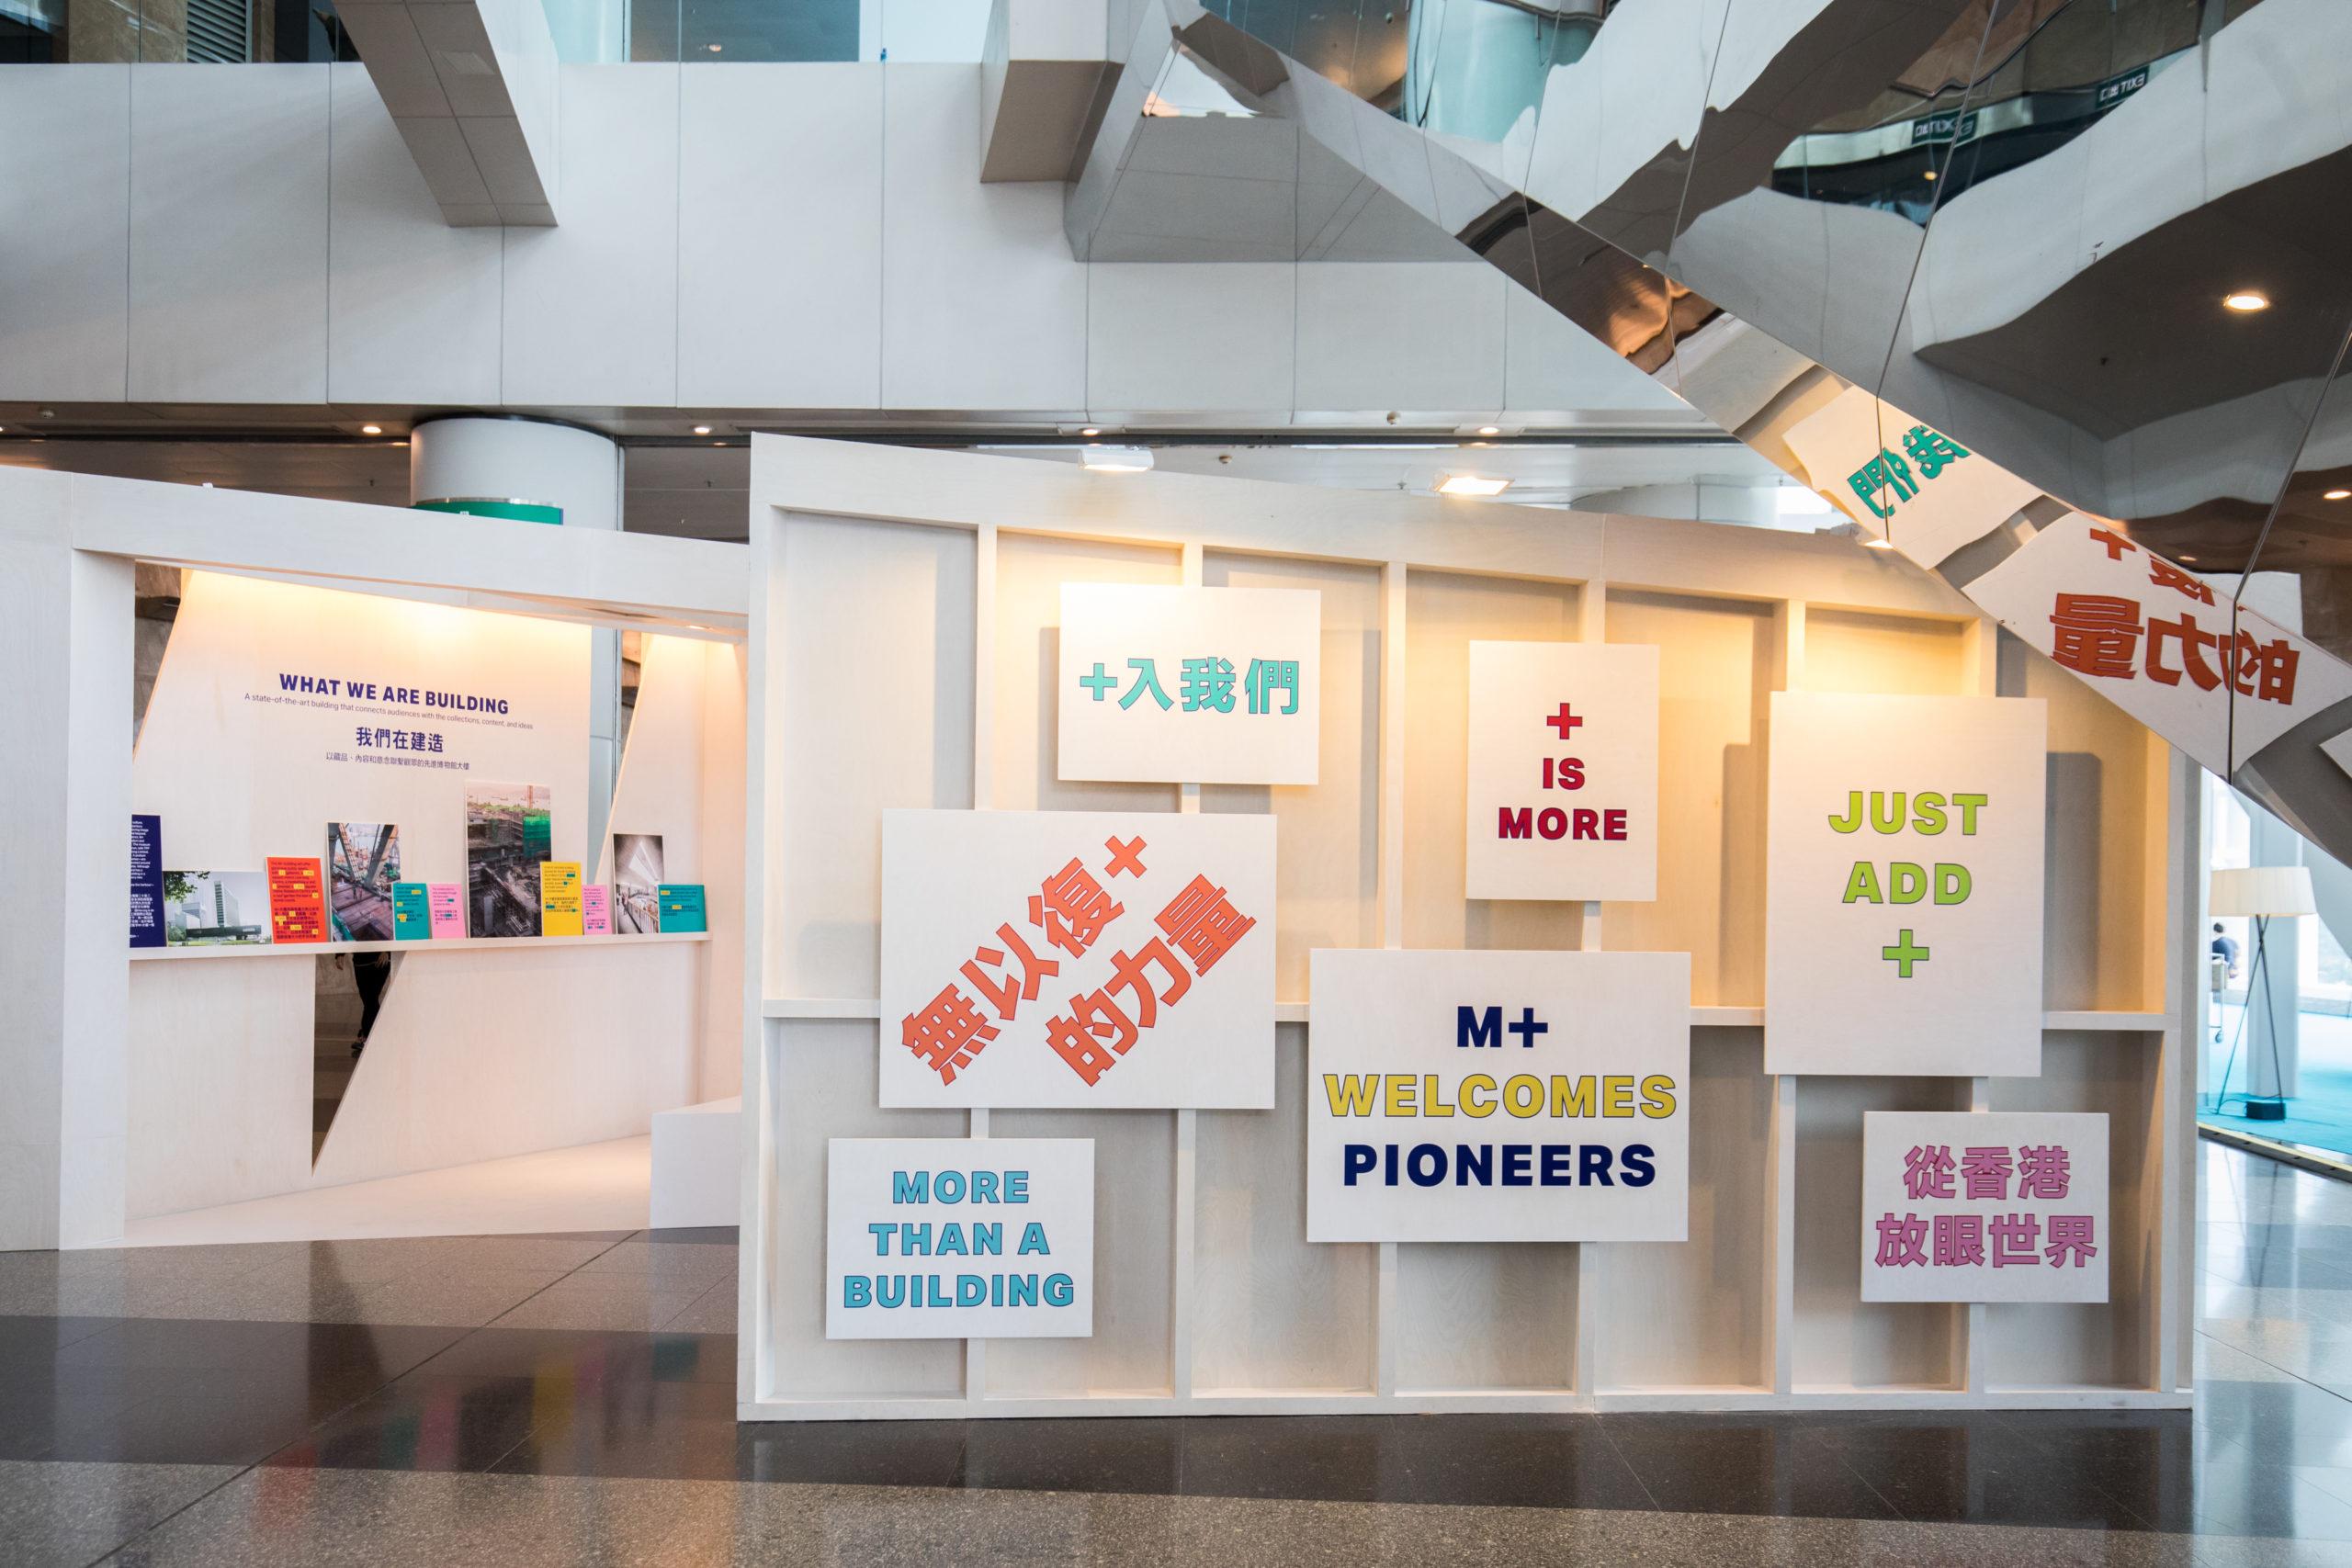 spatial practice architecture office Los Angeles Hong Kong museum plus pavilion art basel hong kong view escalator